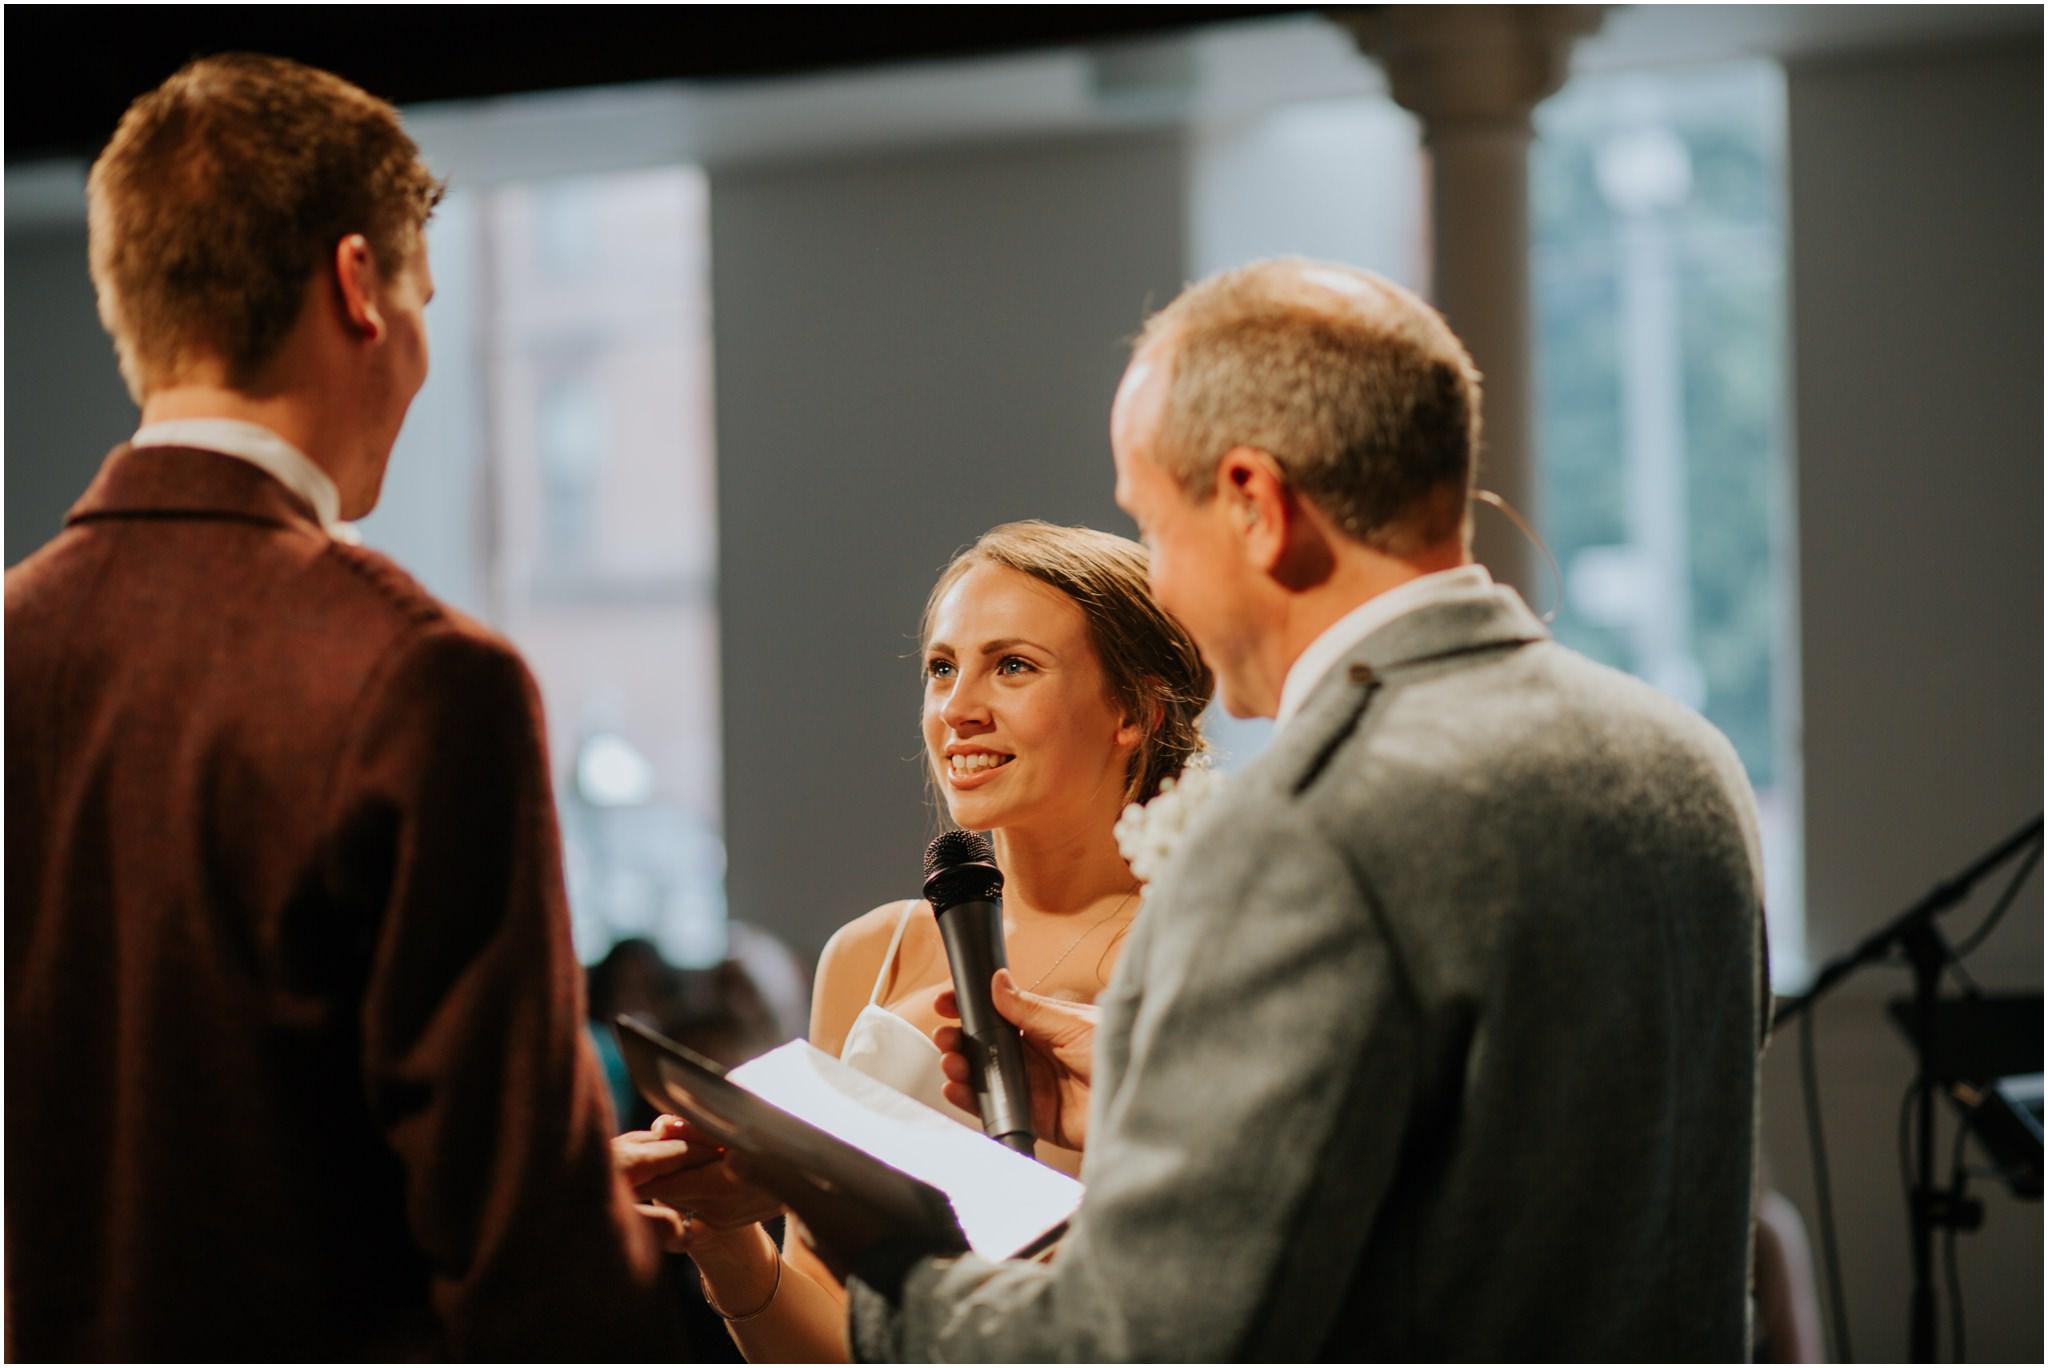 Photography 78 - Glasgow Wedding Photographer - Jordan & Abi - The Waterside Hotel, West Kilbride_0060.jpg